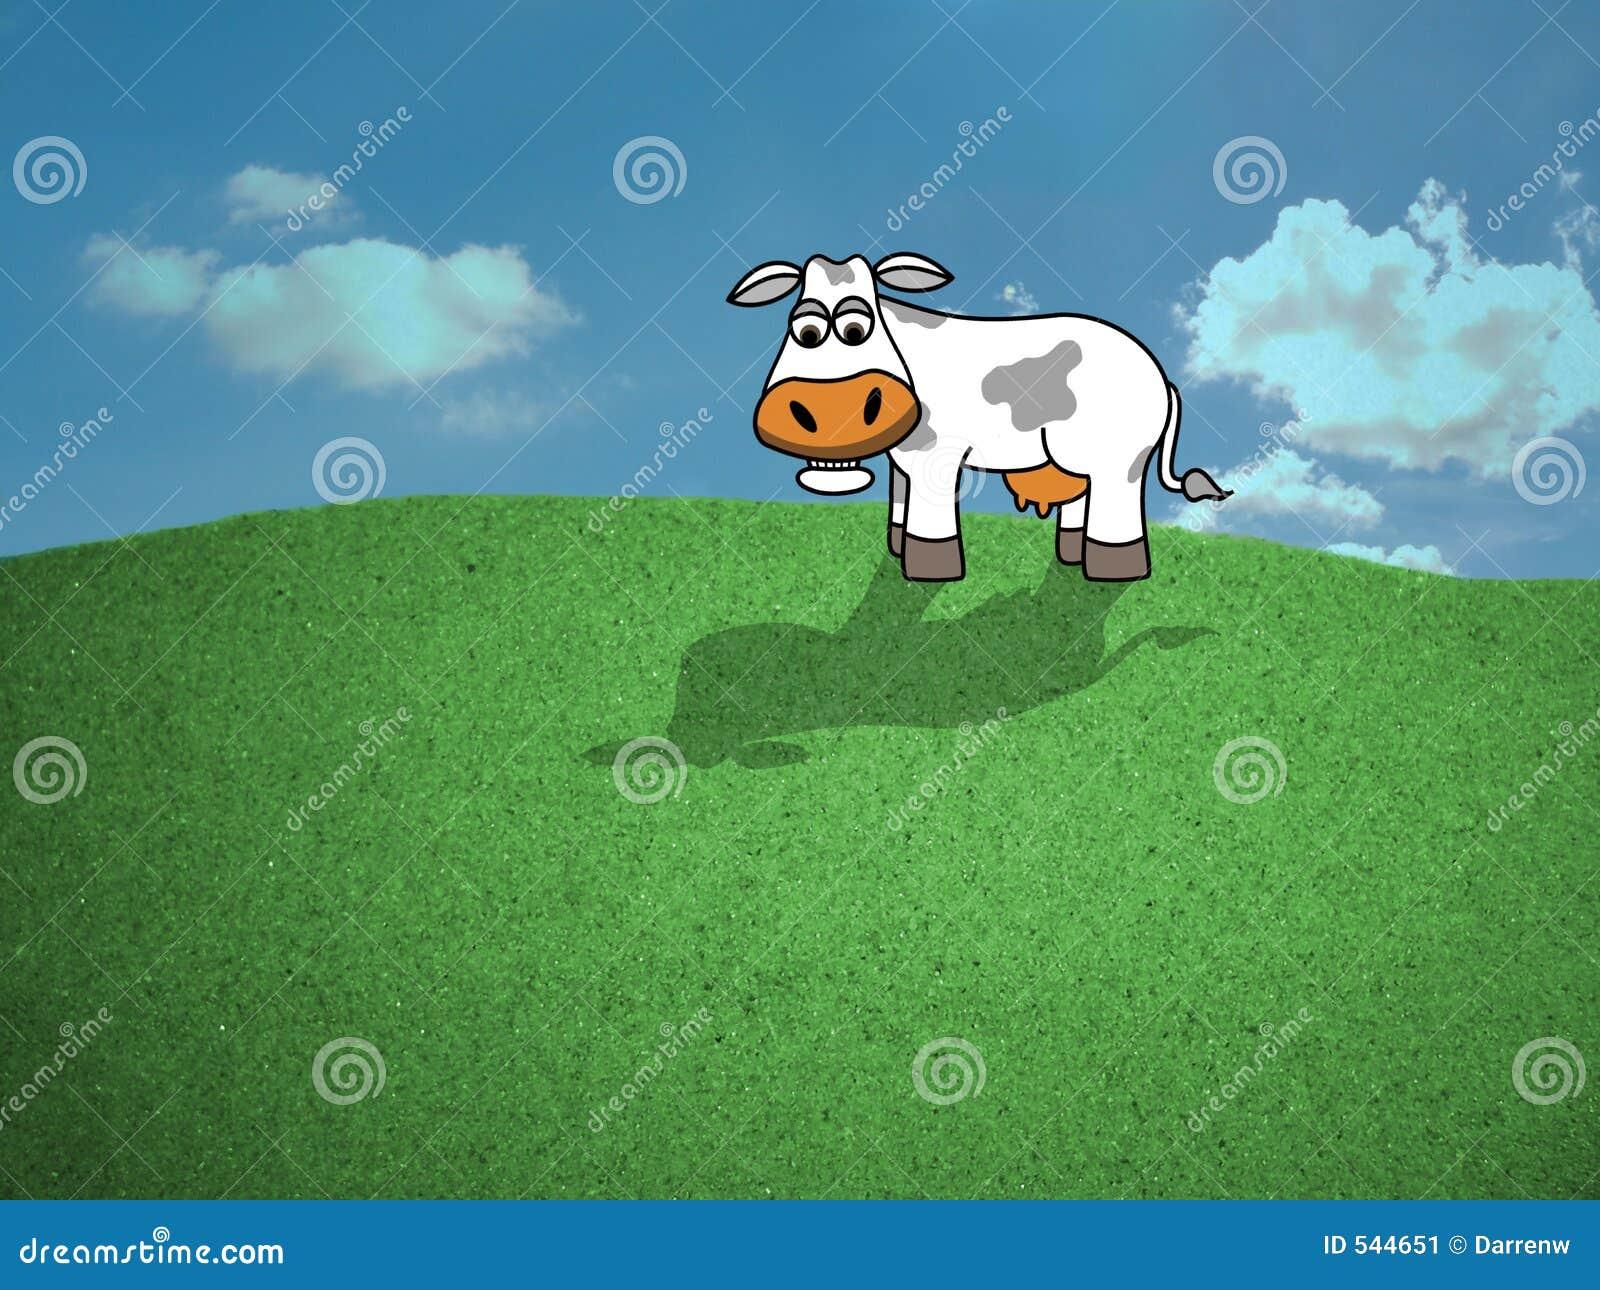 Download 母牛域 库存例证. 插画 包括有 农村, 范围, 仓前空地, 母牛, 查找, 夹子, 敌意, 图画, 夏天, 贝多芬 - 544651